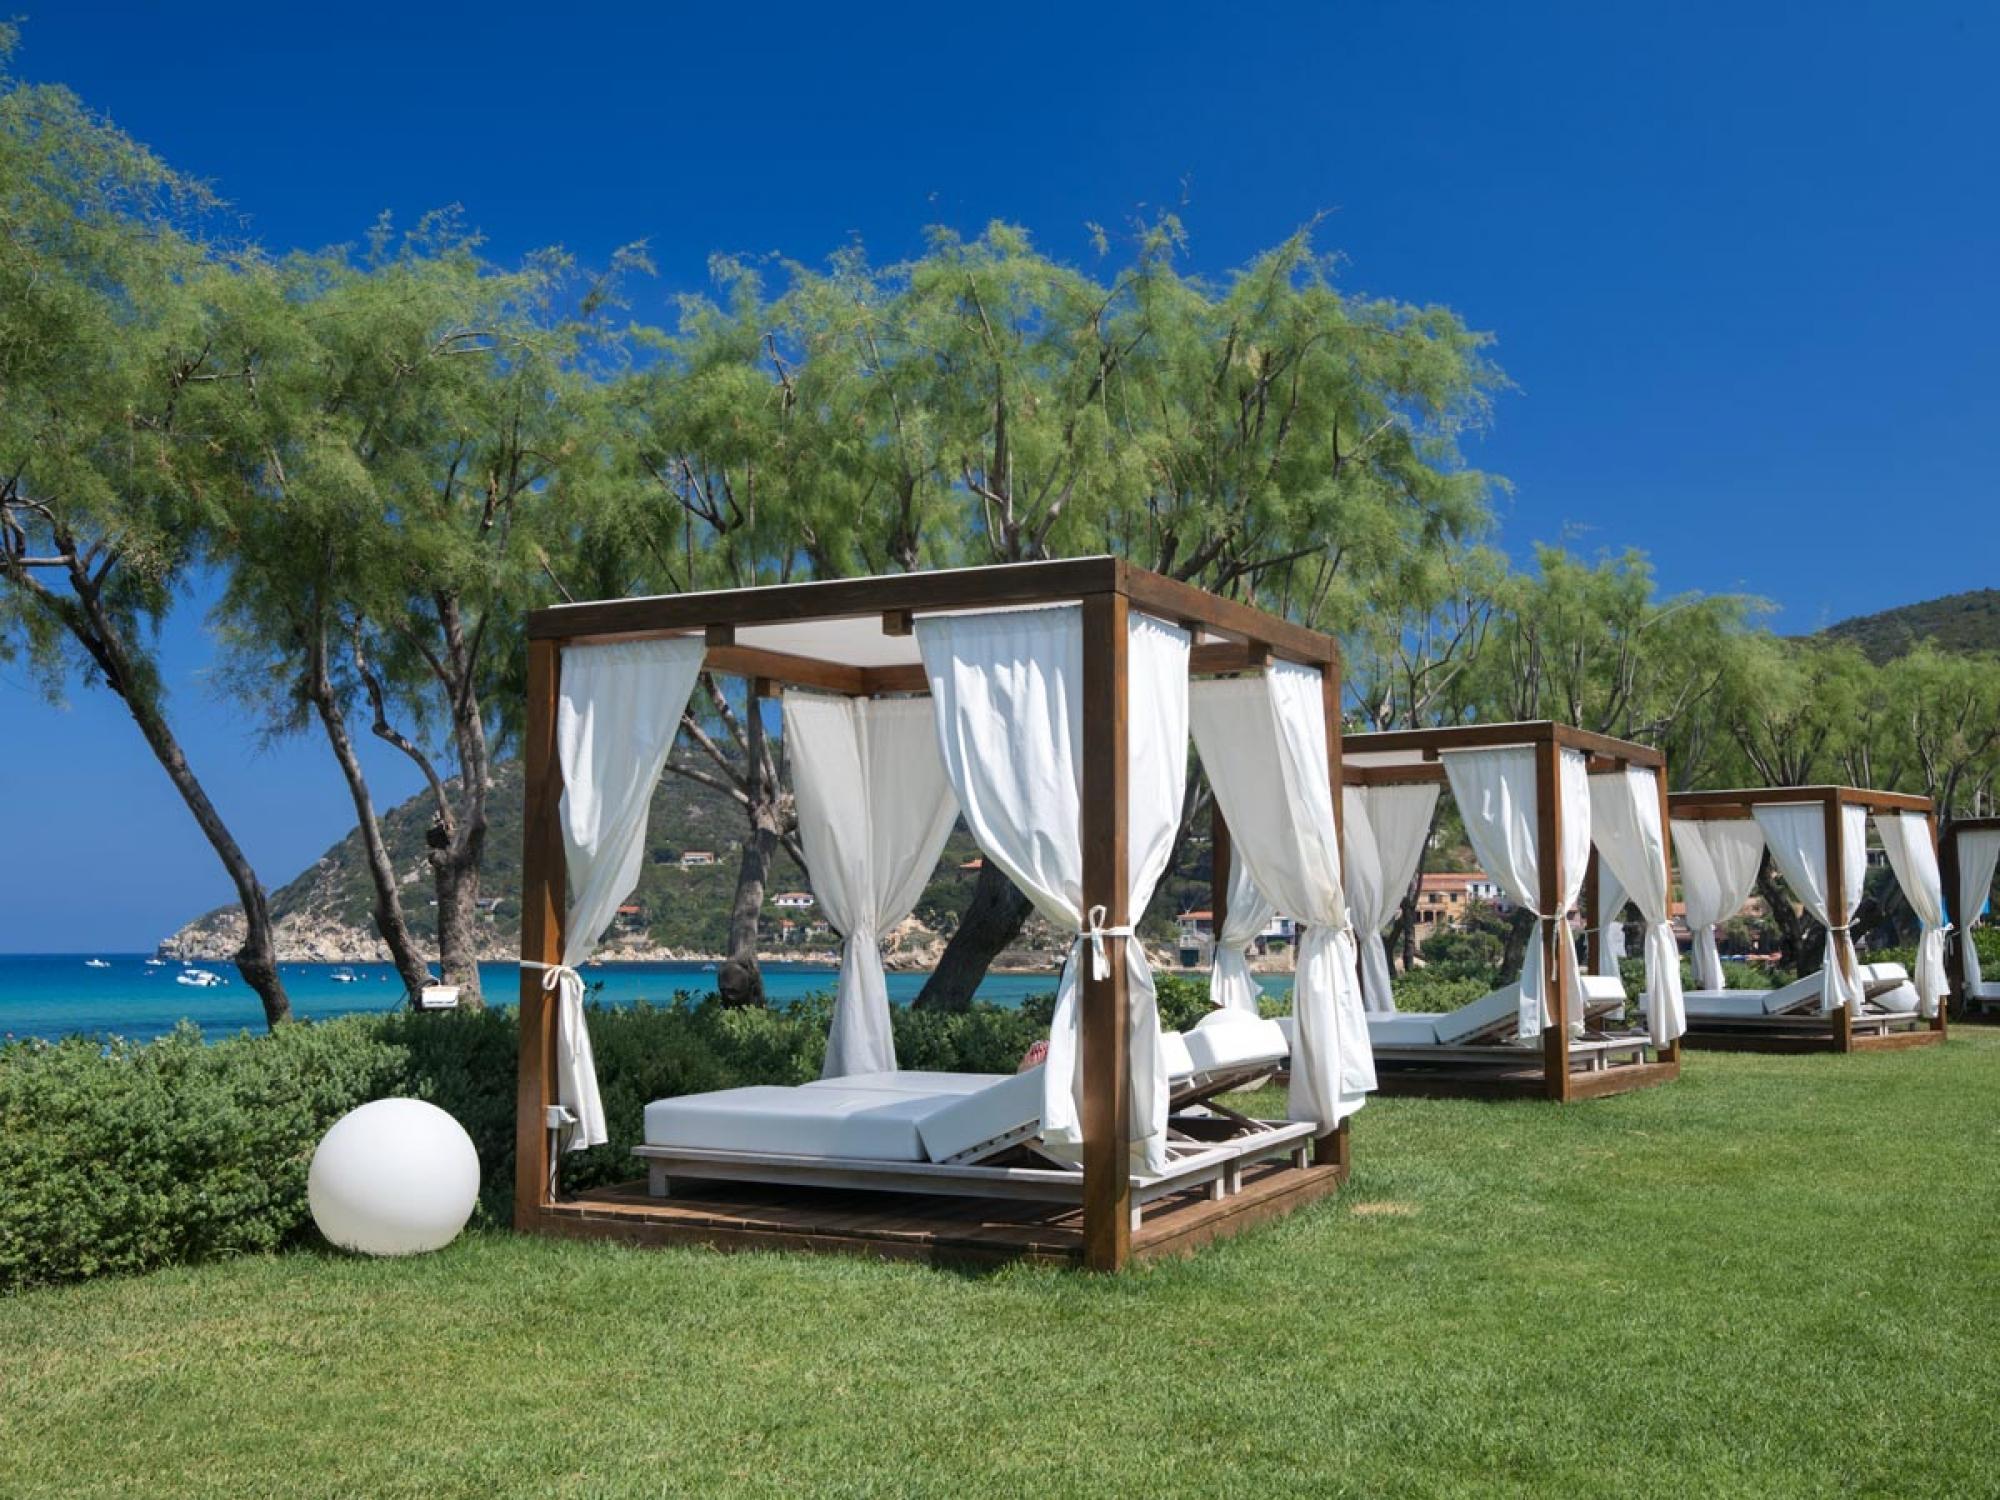 Offerte isola d'Elba golf - Offerte isola d'Elba - vacanze ...